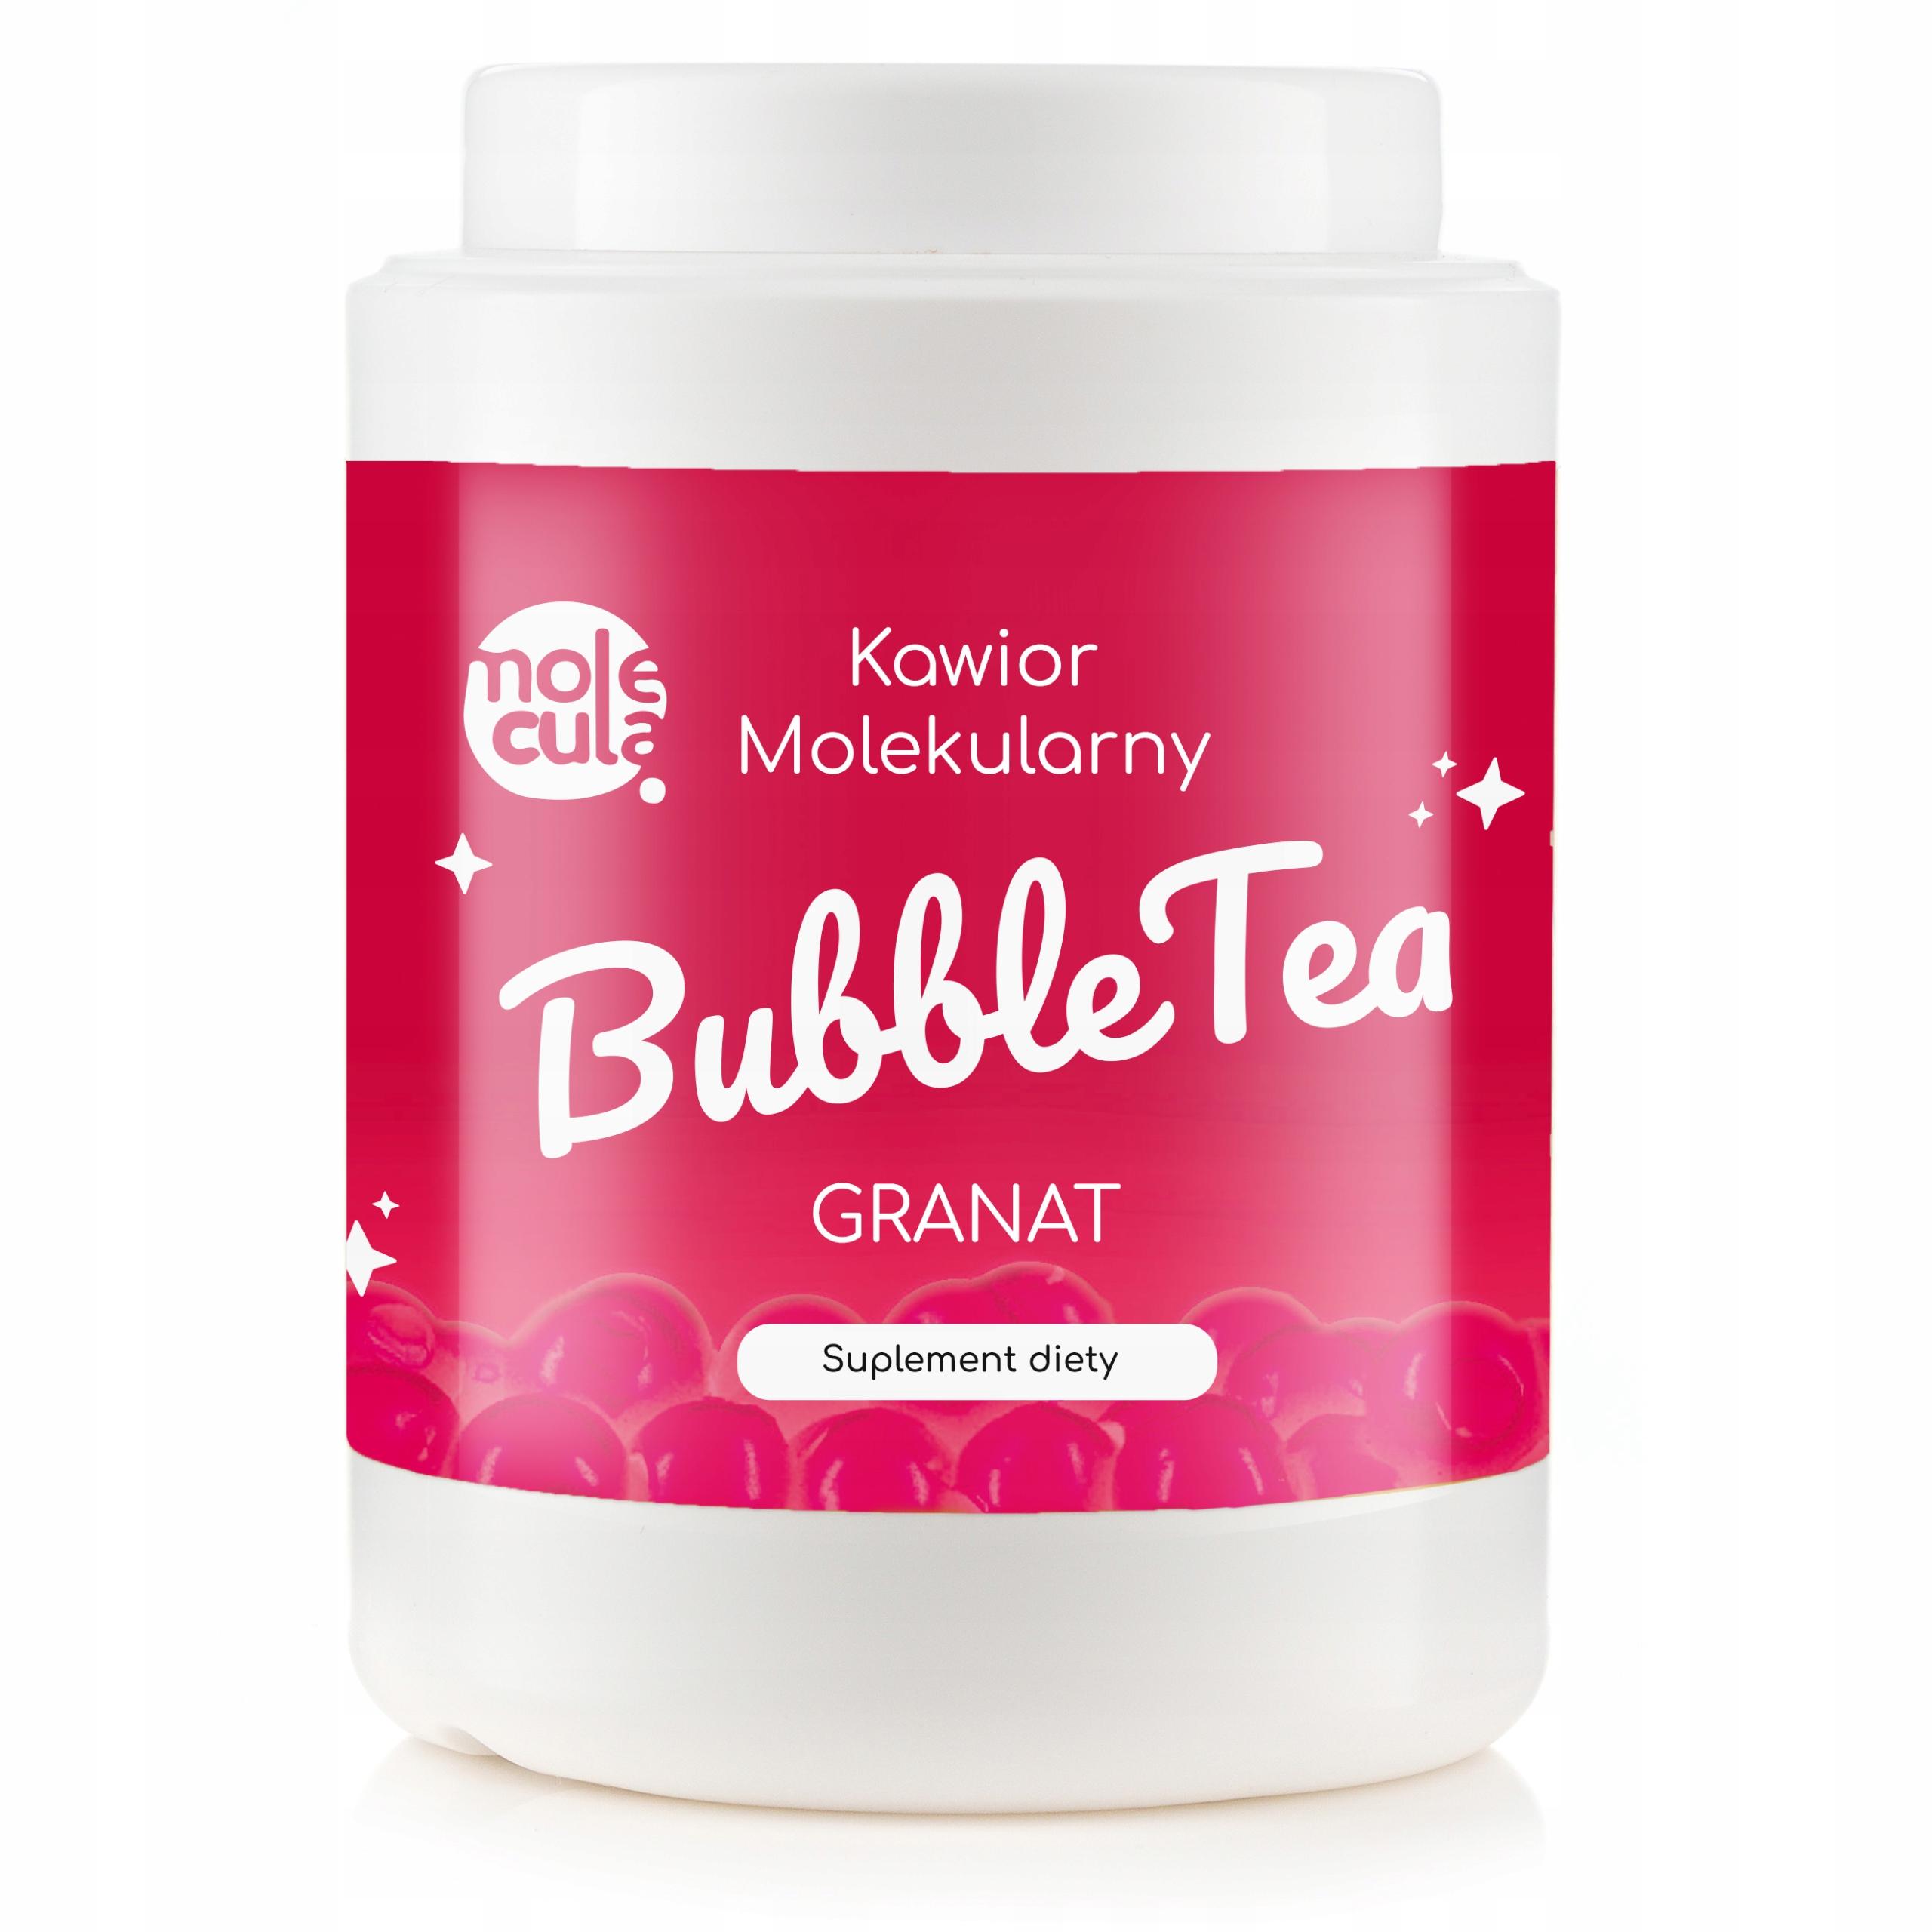 Bubble Tea BBs Molecular Caviar 2 КГ ГРАНАТ